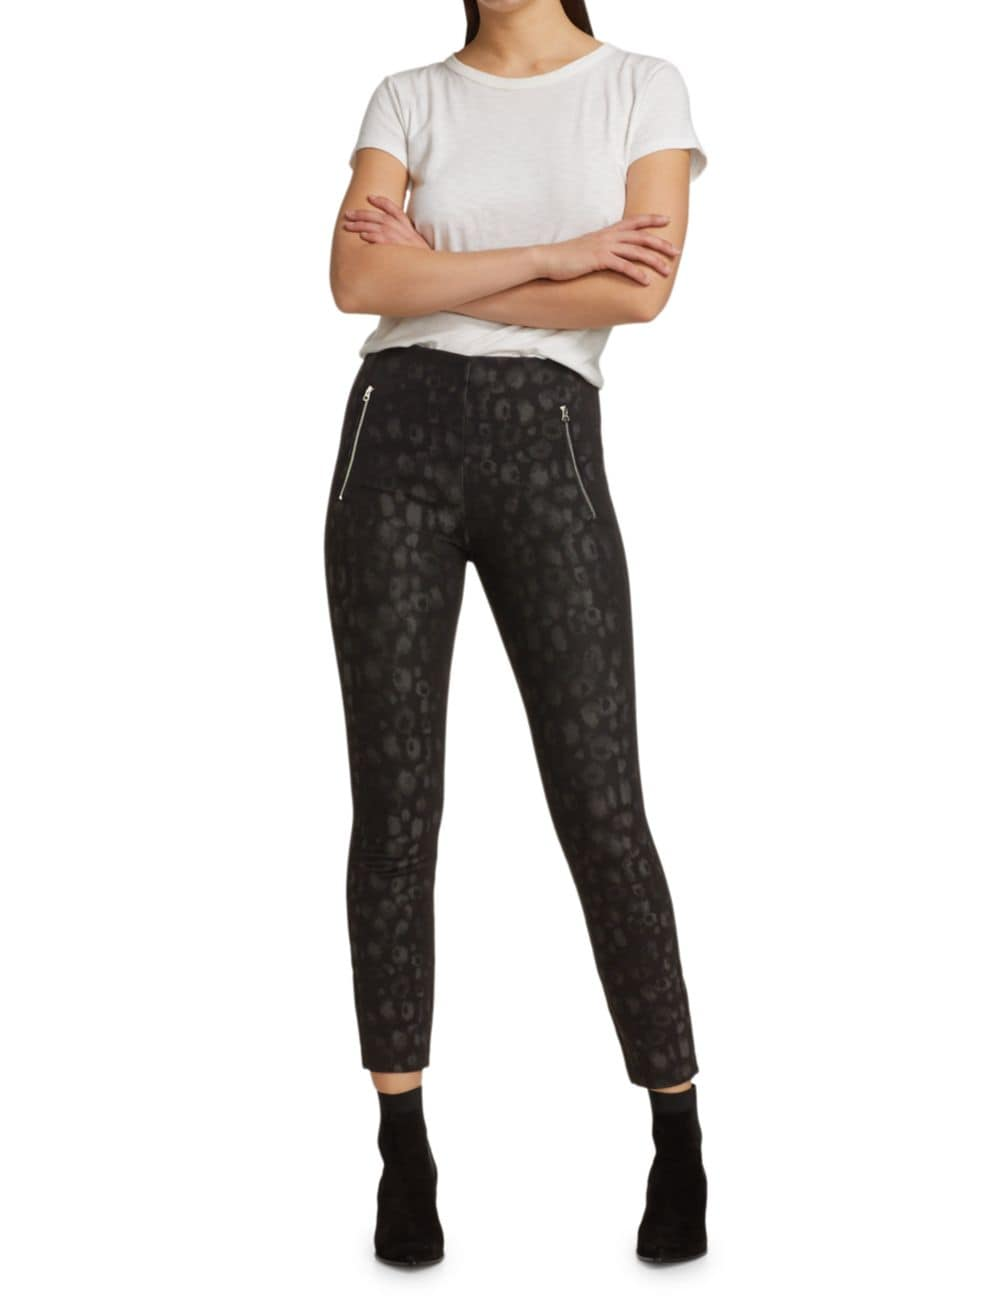 Rag & Bone Simone Leopard Leggings | SaksFifthAvenue